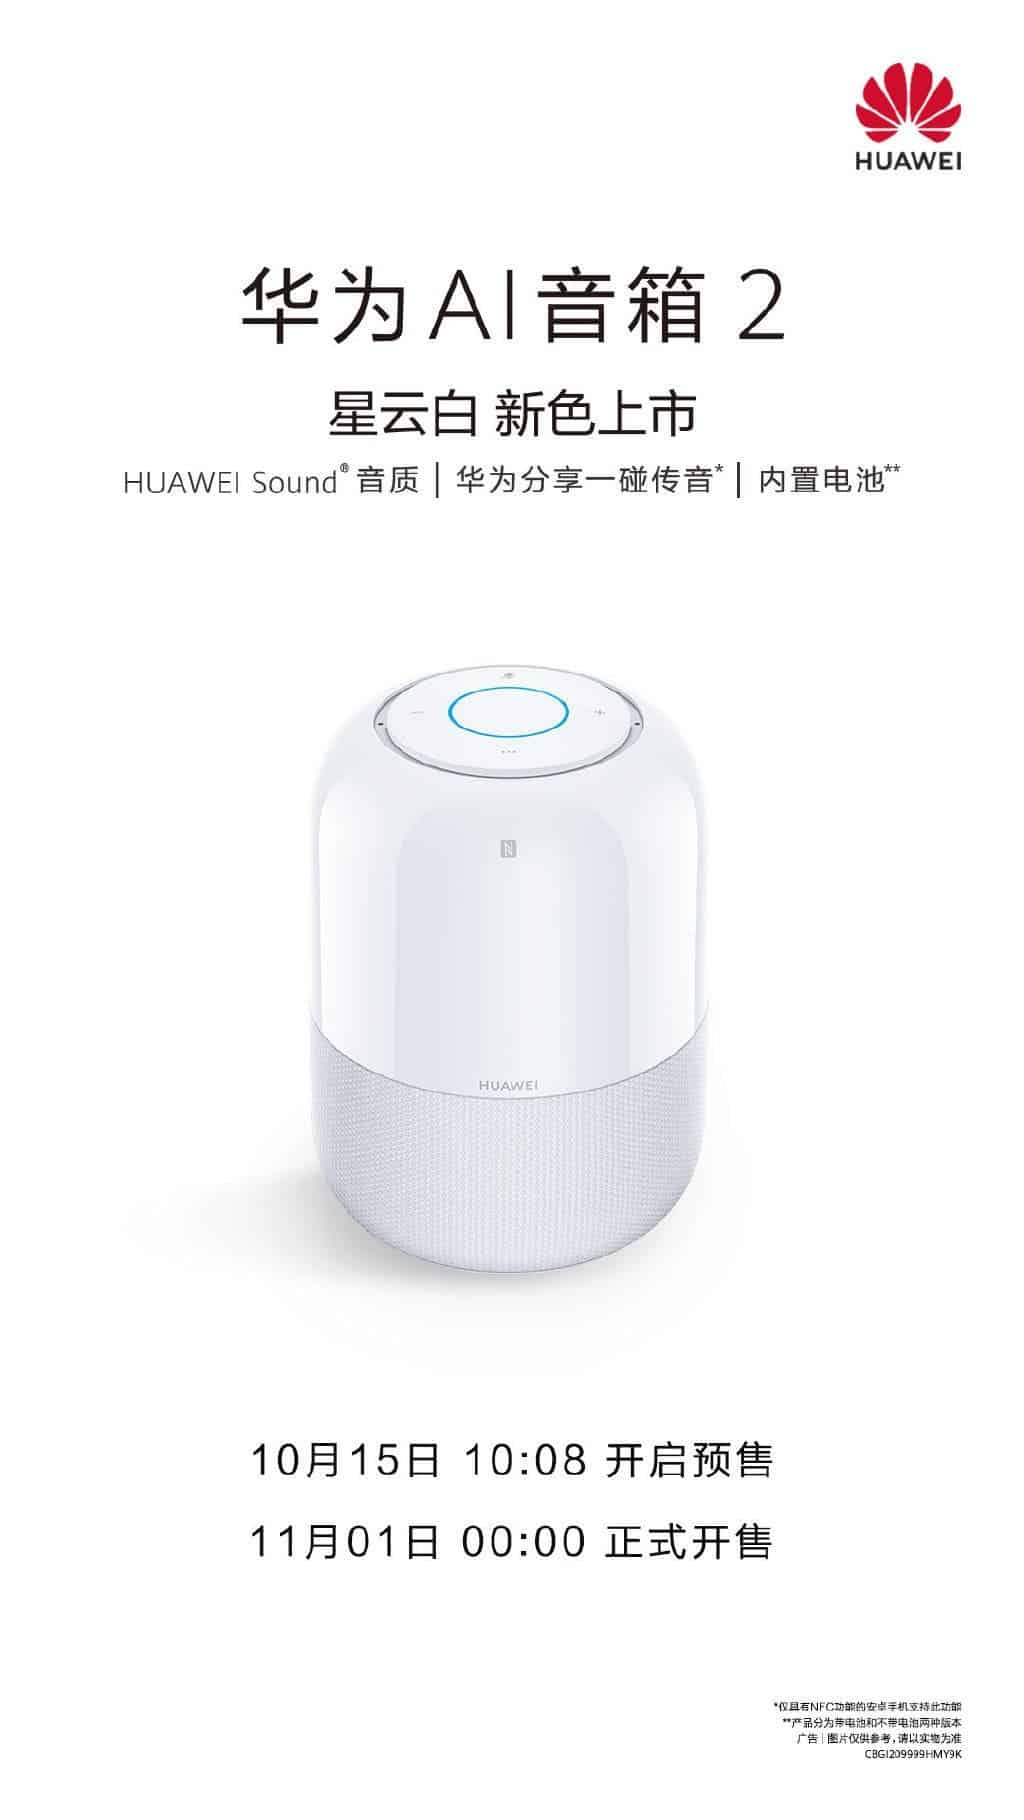 Huawei AI Speaker 2 Nebula White